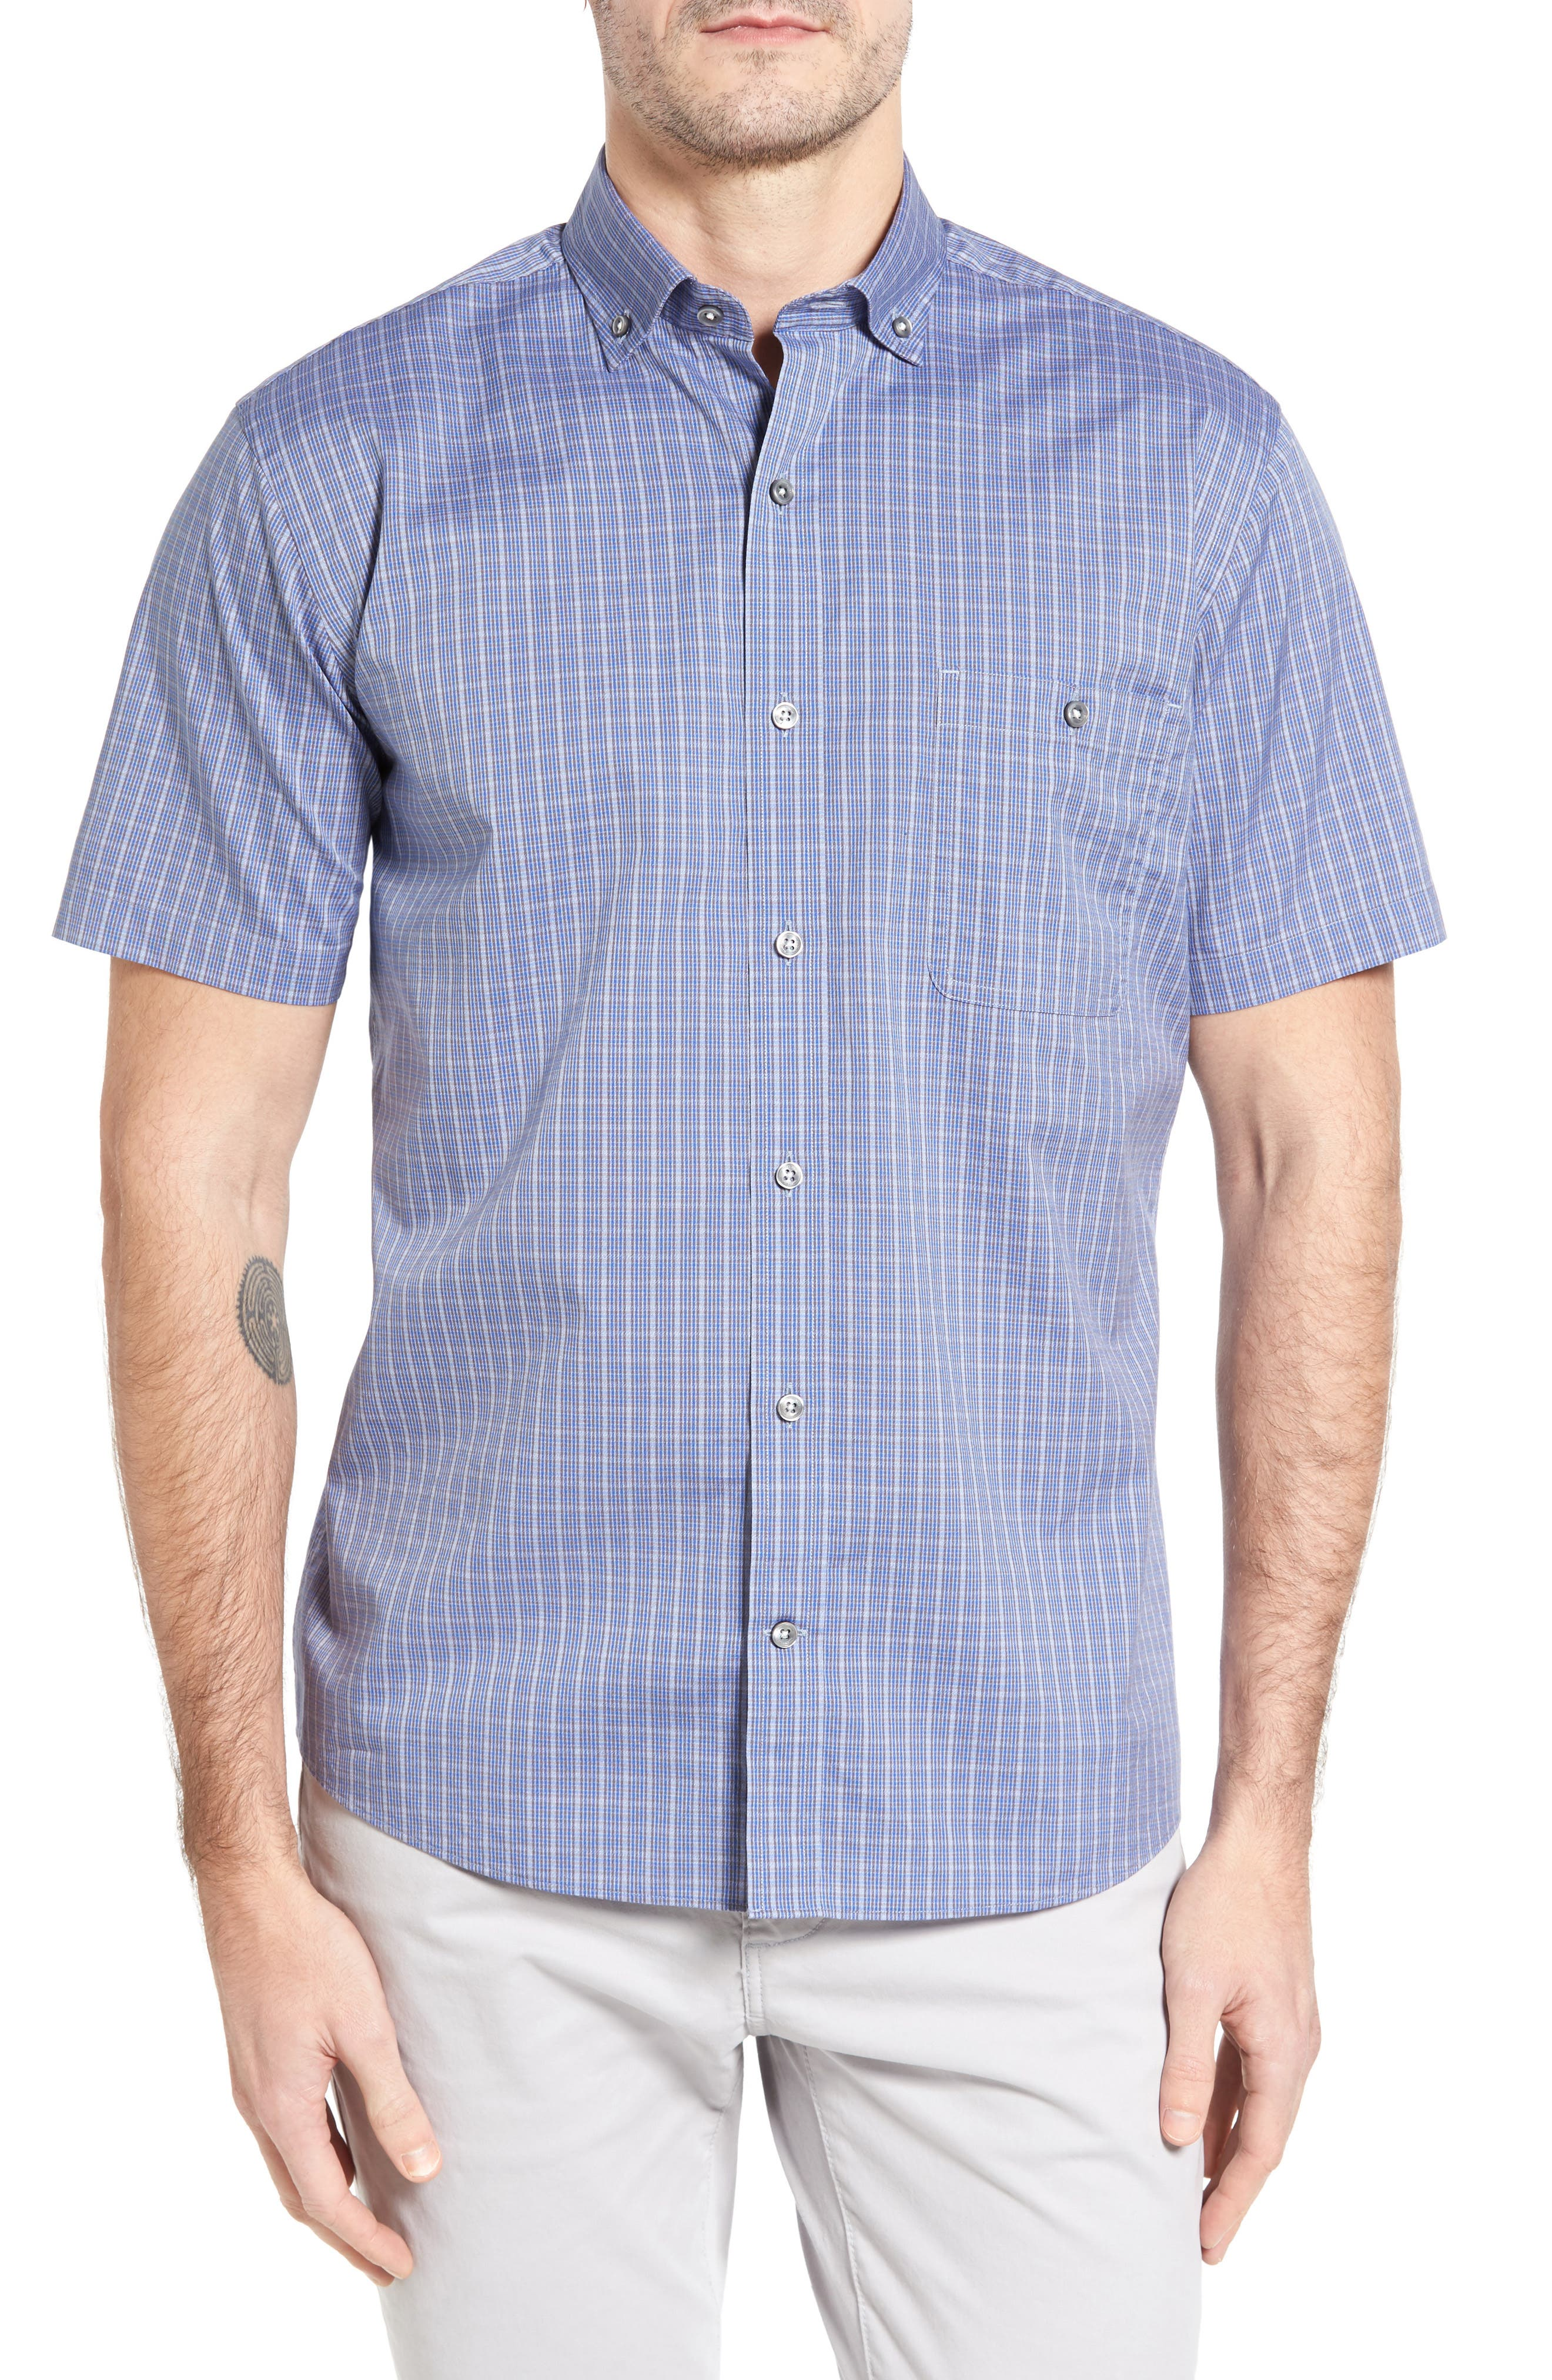 Maker & Company Jaspe Check Sport Shirt